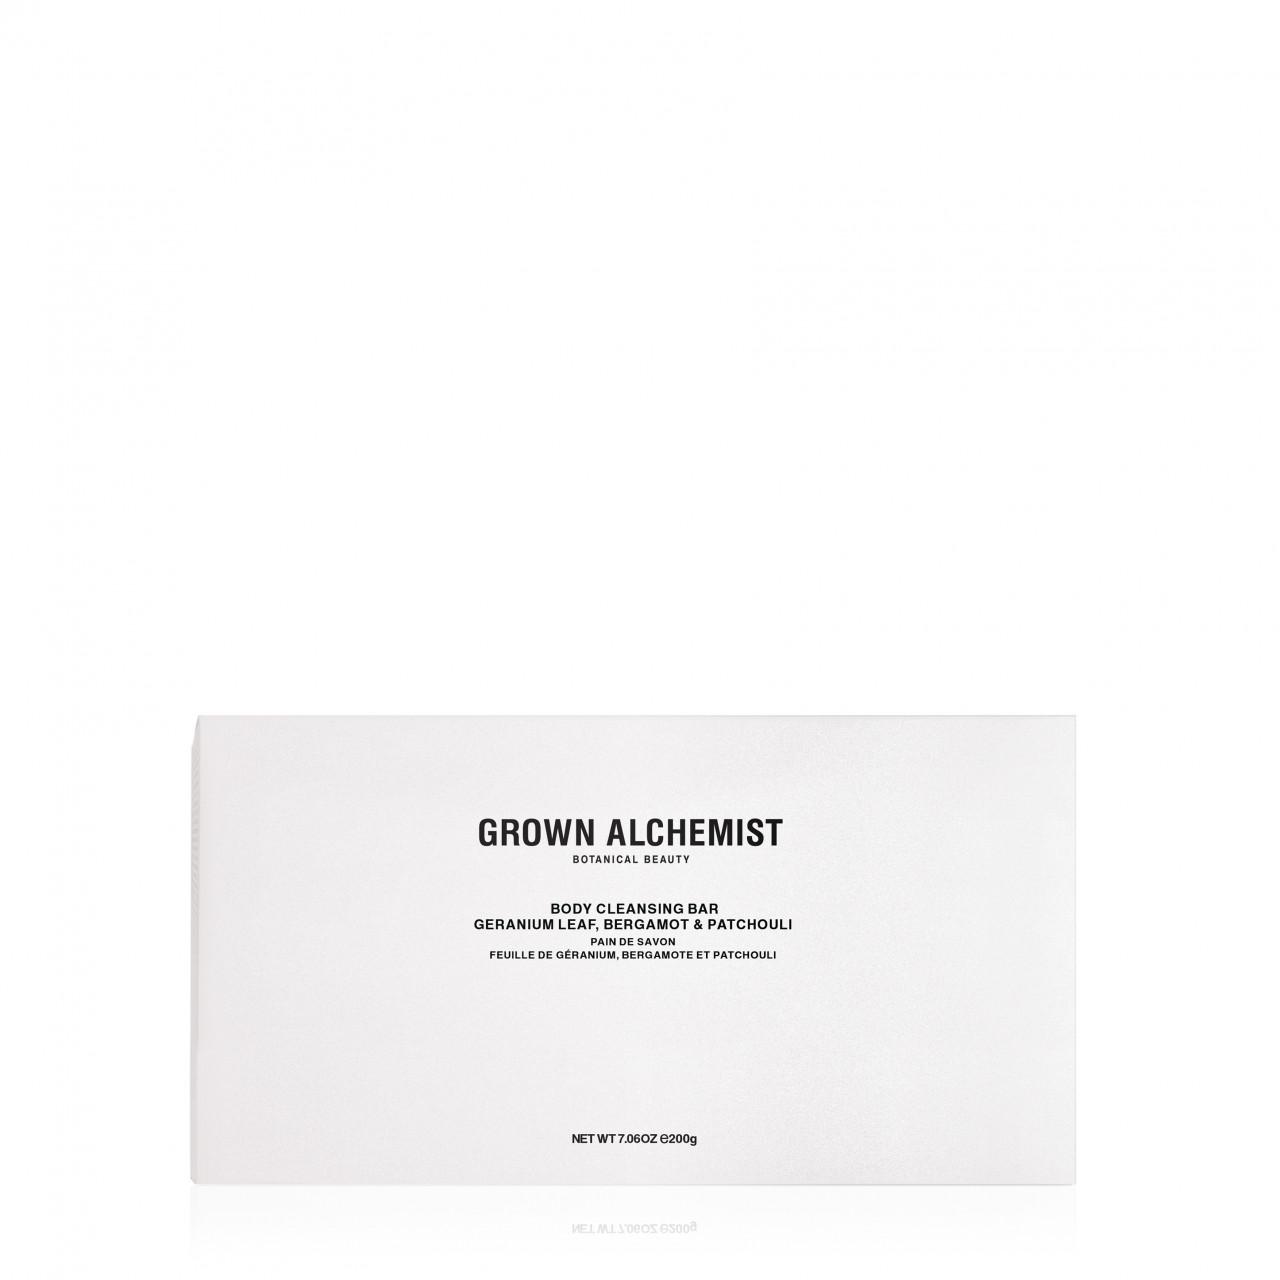 grown-alchemist-body-cleansing-bar-geranium-leaf-bergamot-patchouli-seife